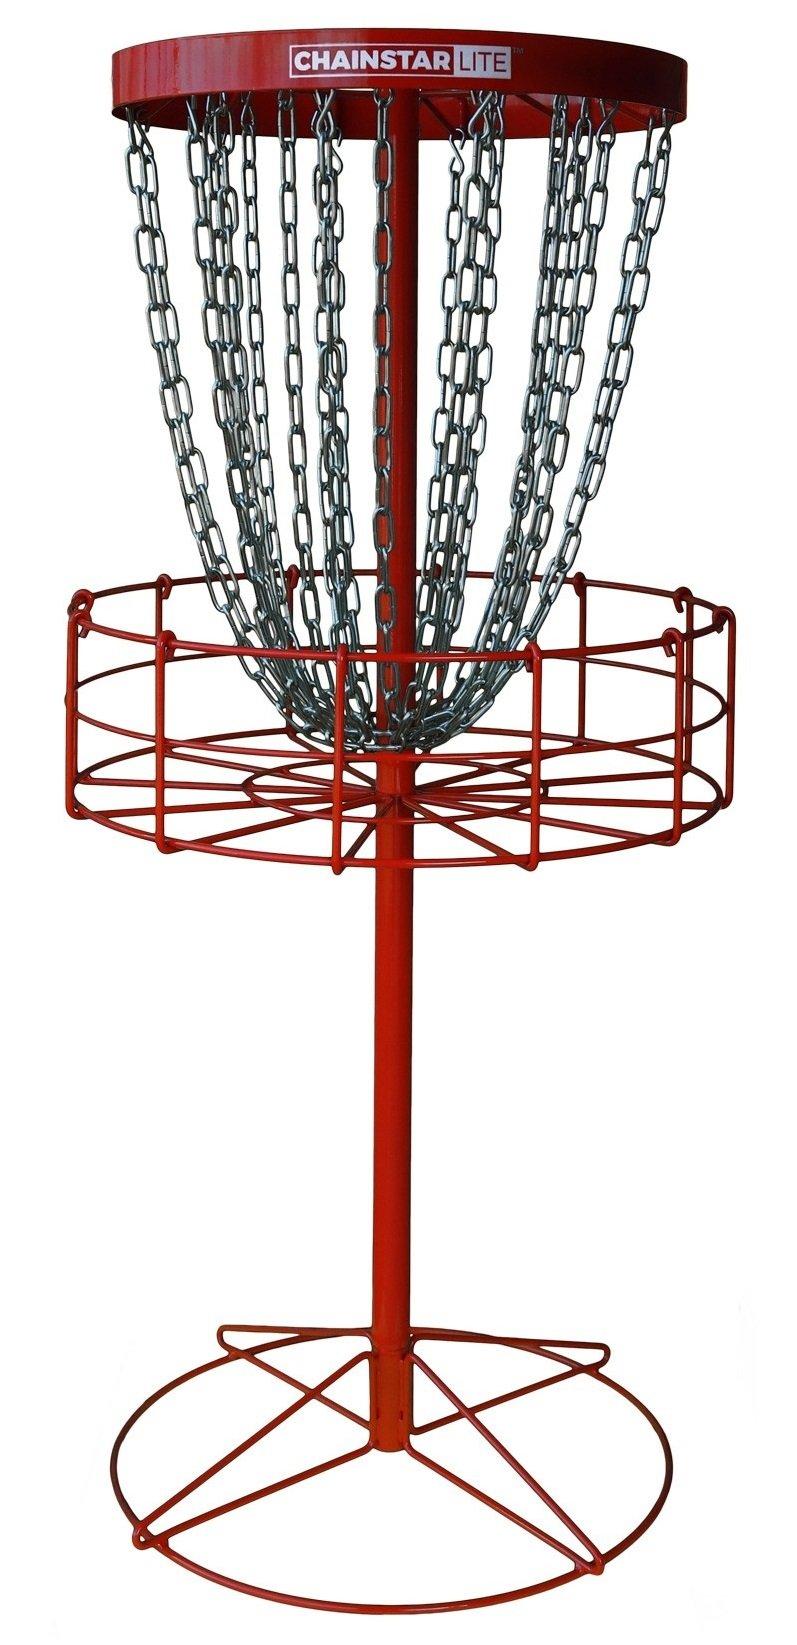 Discraft Chainstar LITE 24-Chain Disc Golf Basket - Red by Discraft